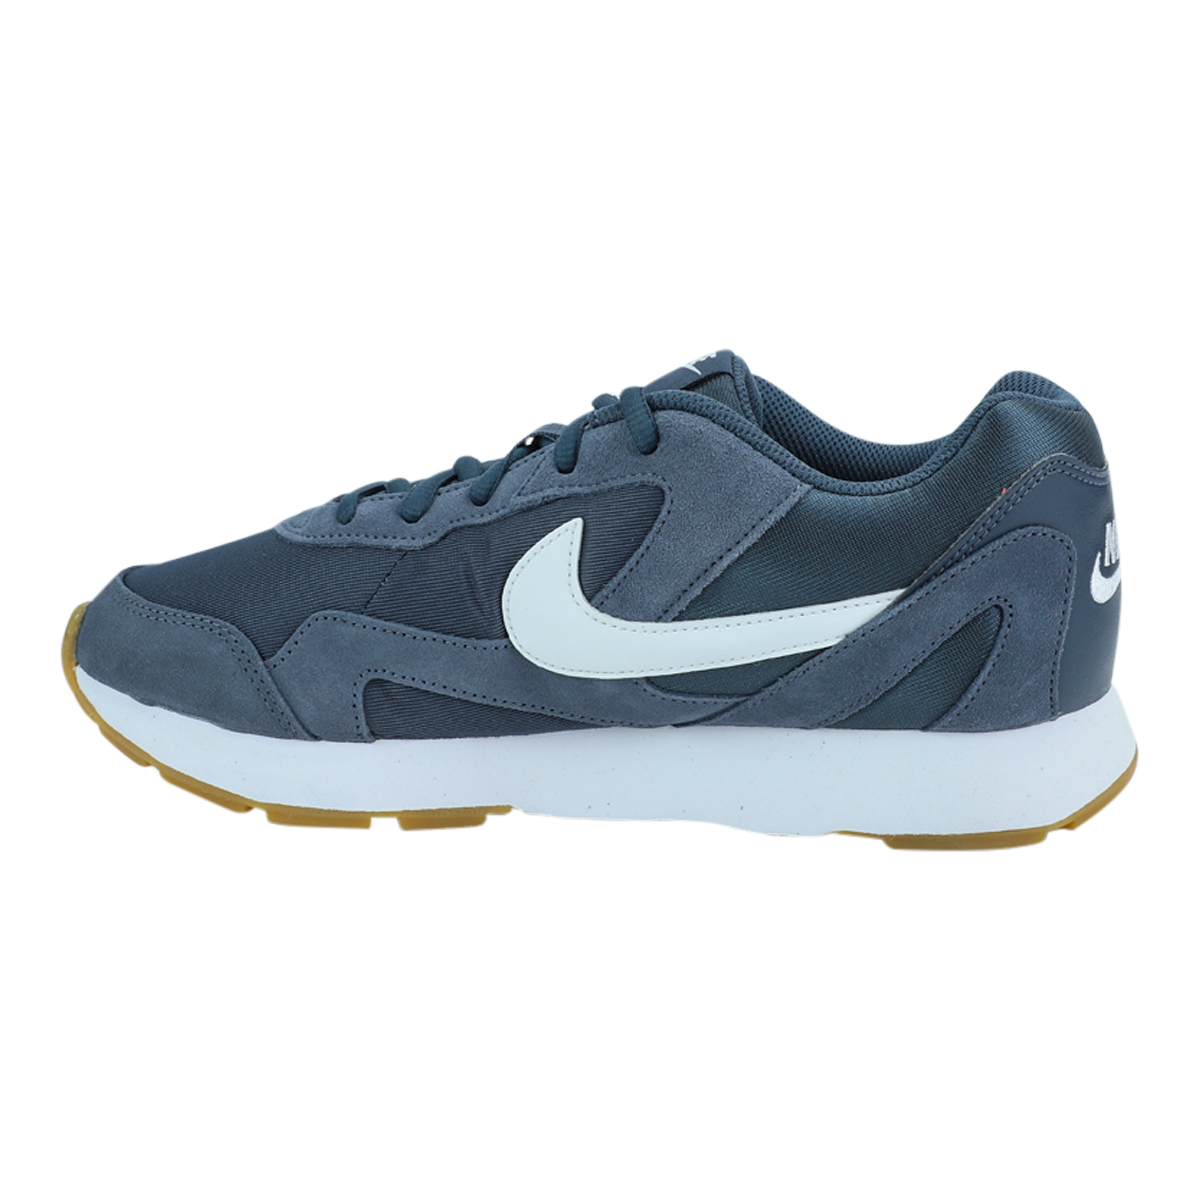 Nike-Men-039-s-Delfine-Running-Shoes thumbnail 14